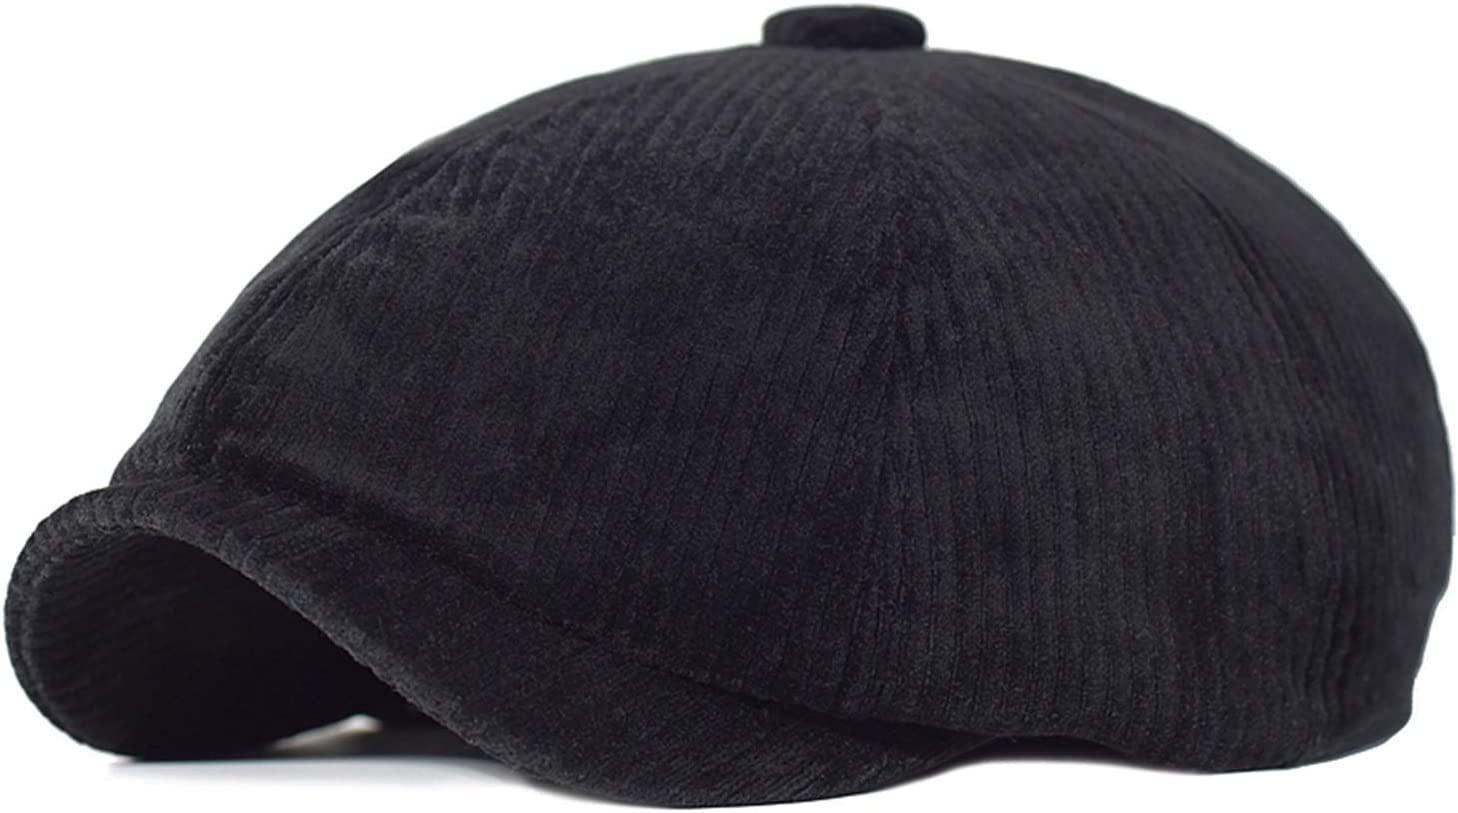 JSJJAER Latest item Sun Hats Unisex Spring Autumn an Winter National products Caps Men Newsboy